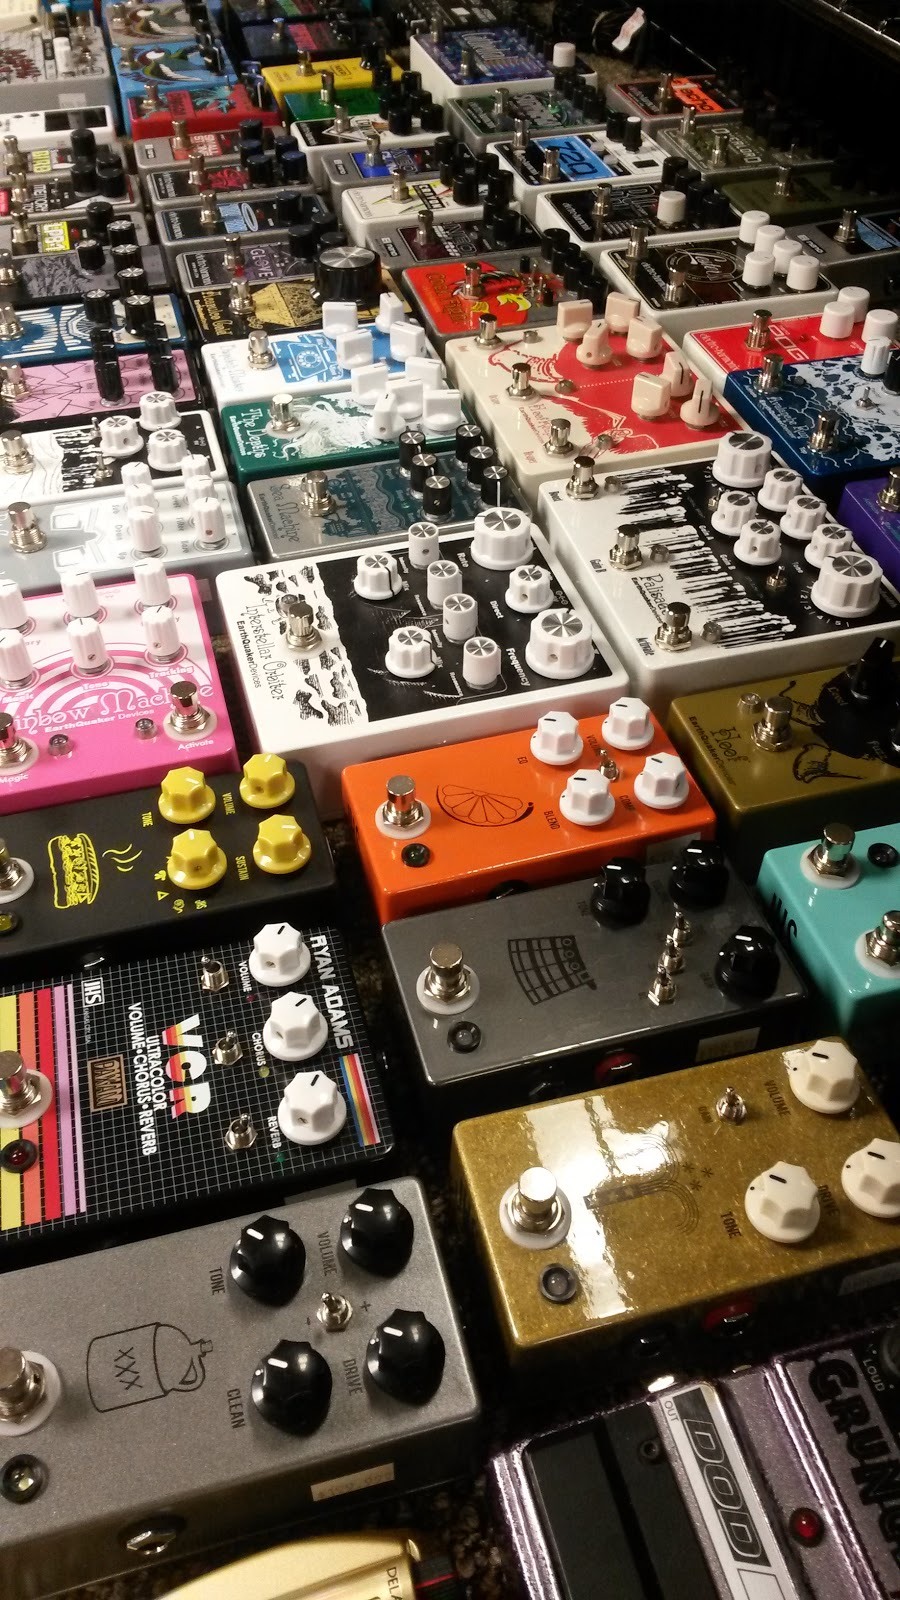 Guru Guitars - electronics store  | Photo 3 of 7 | Address: 5221 Hillsborough St, Raleigh, NC 27606, USA | Phone: (919) 833-6607